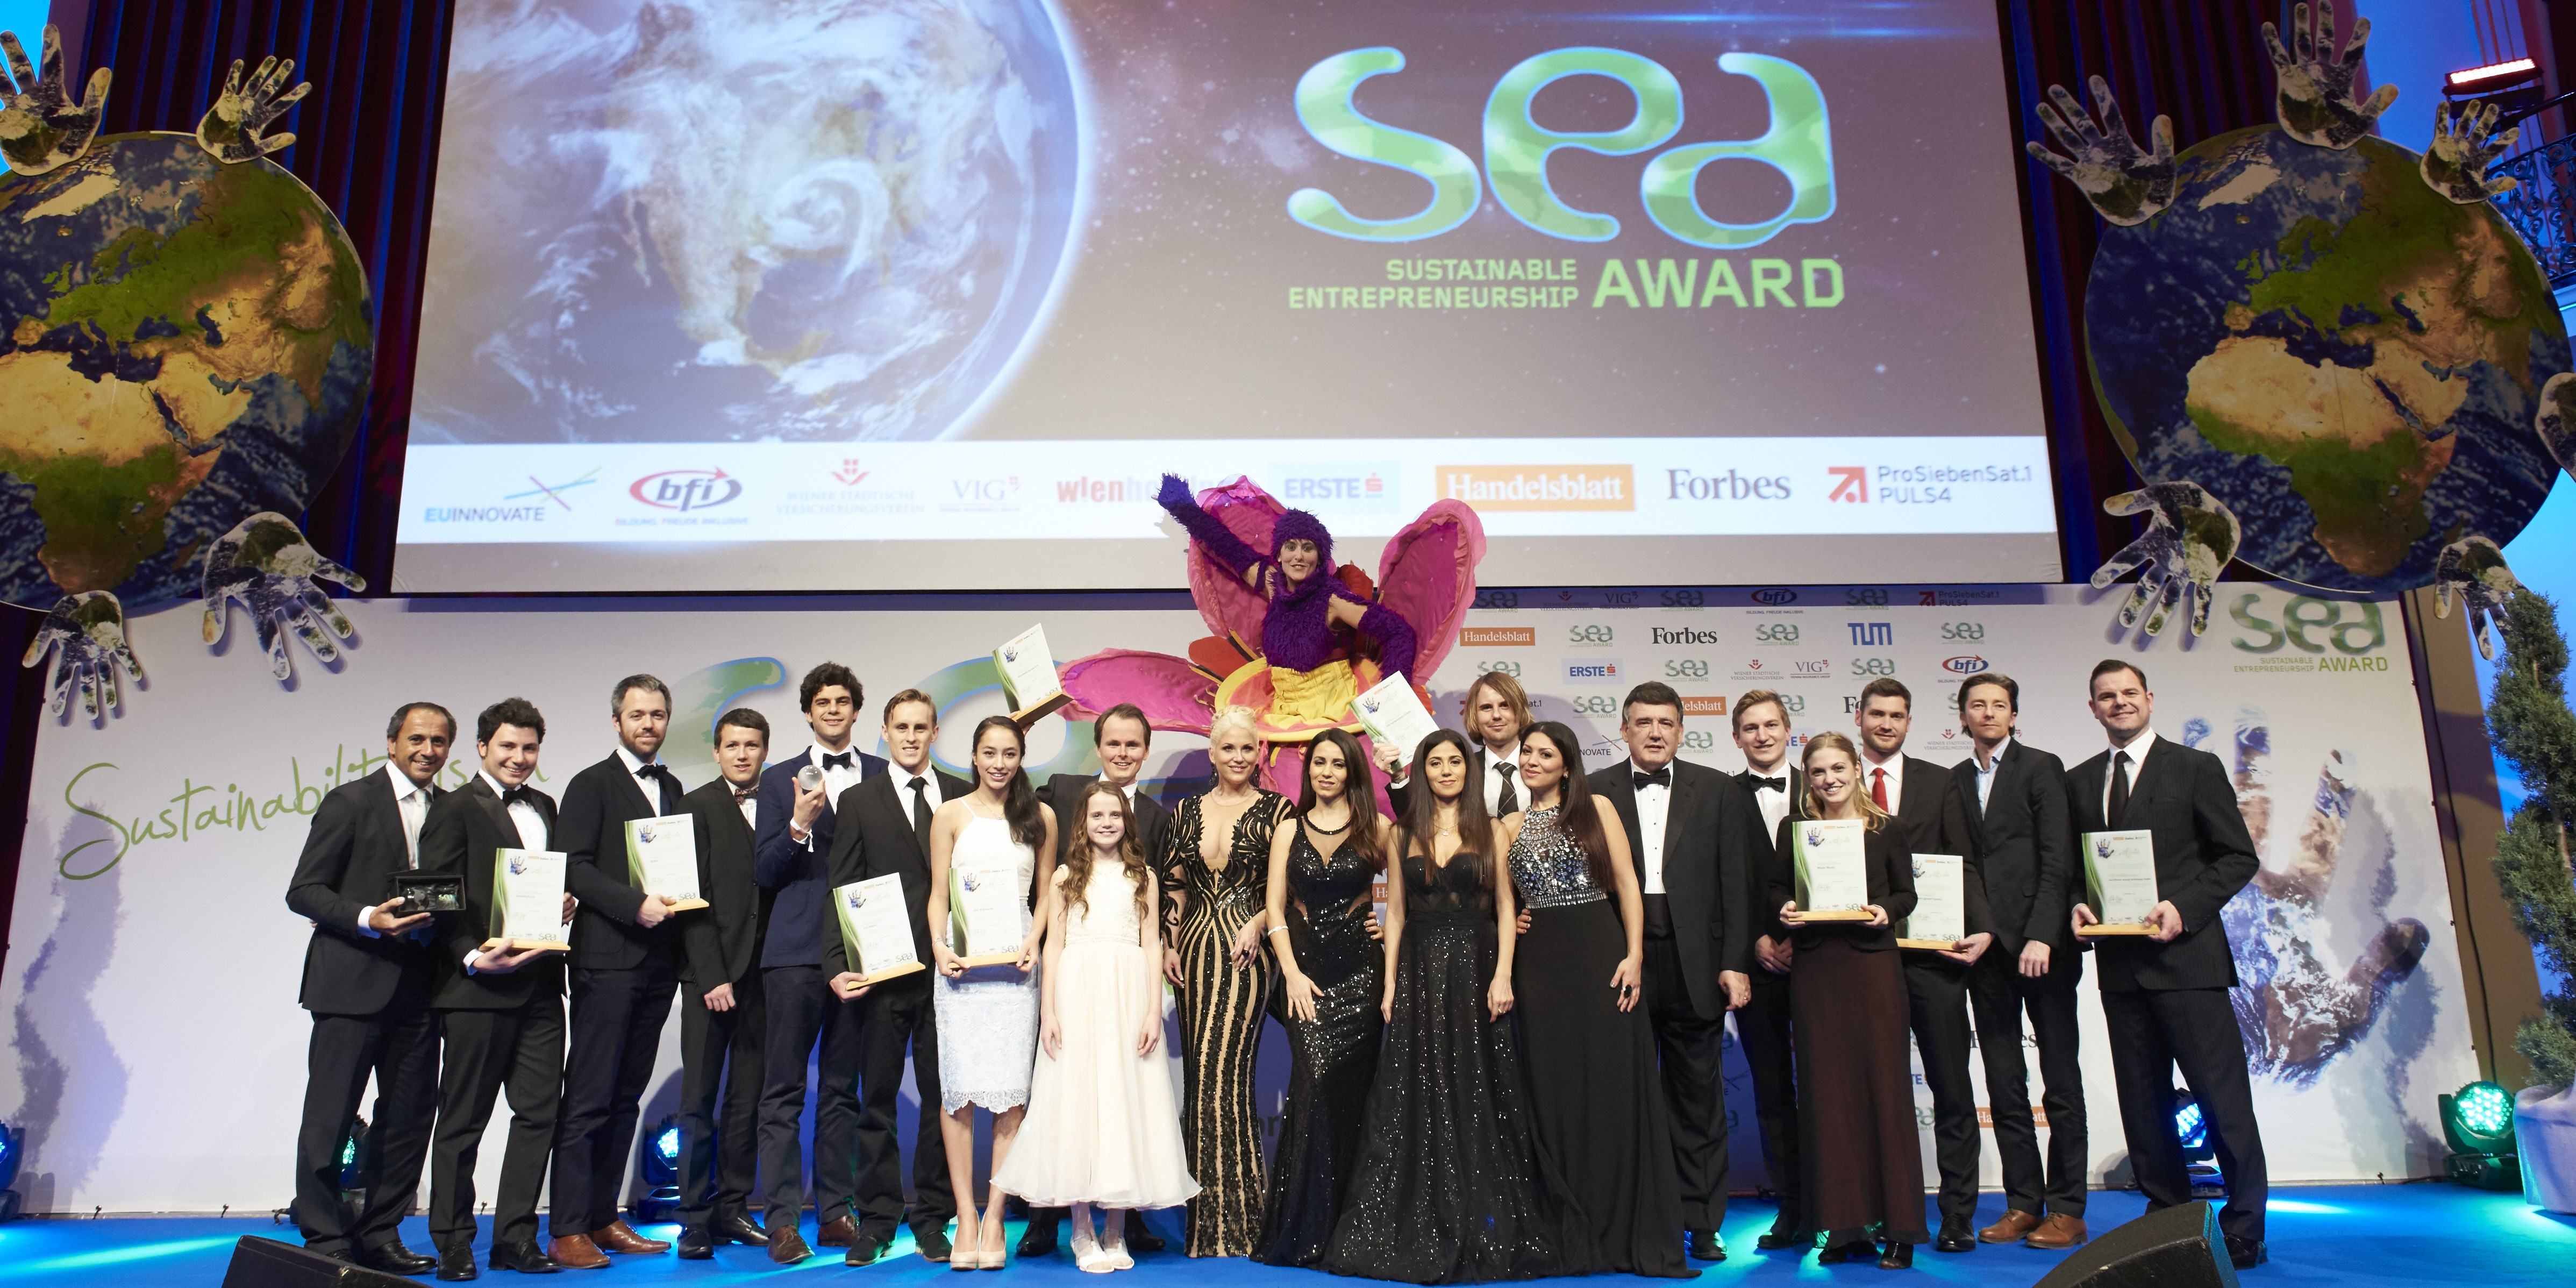 SEA 2016 – Sustainable Entrepreneurship Award: Werde Sustainable Entrepreneur des Jahres 2016